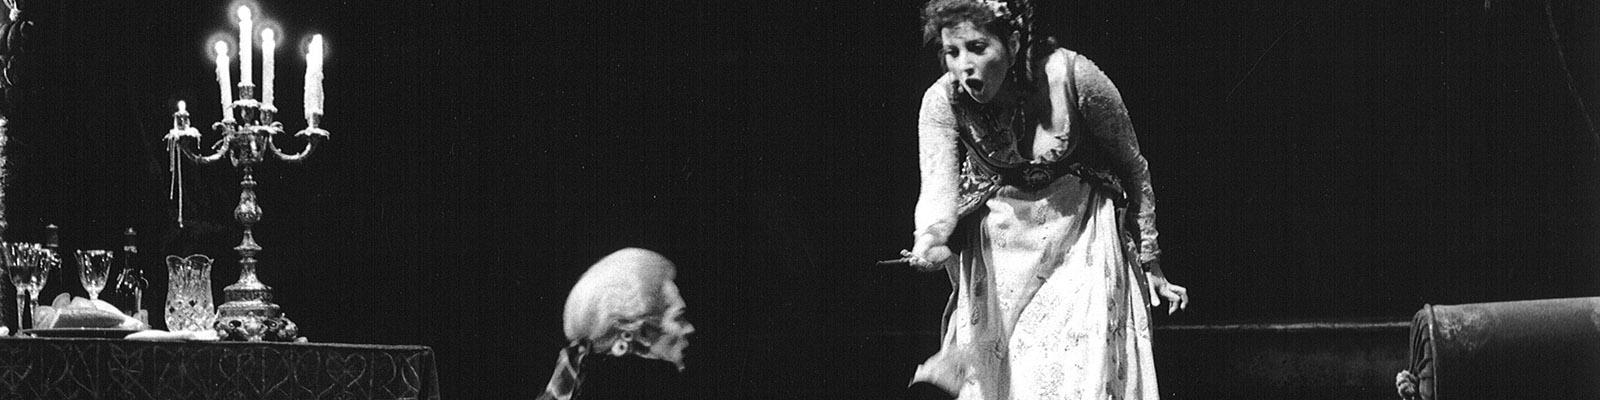 1990 1991 1999 2000 Seasons Lyric Opera Of Chicago